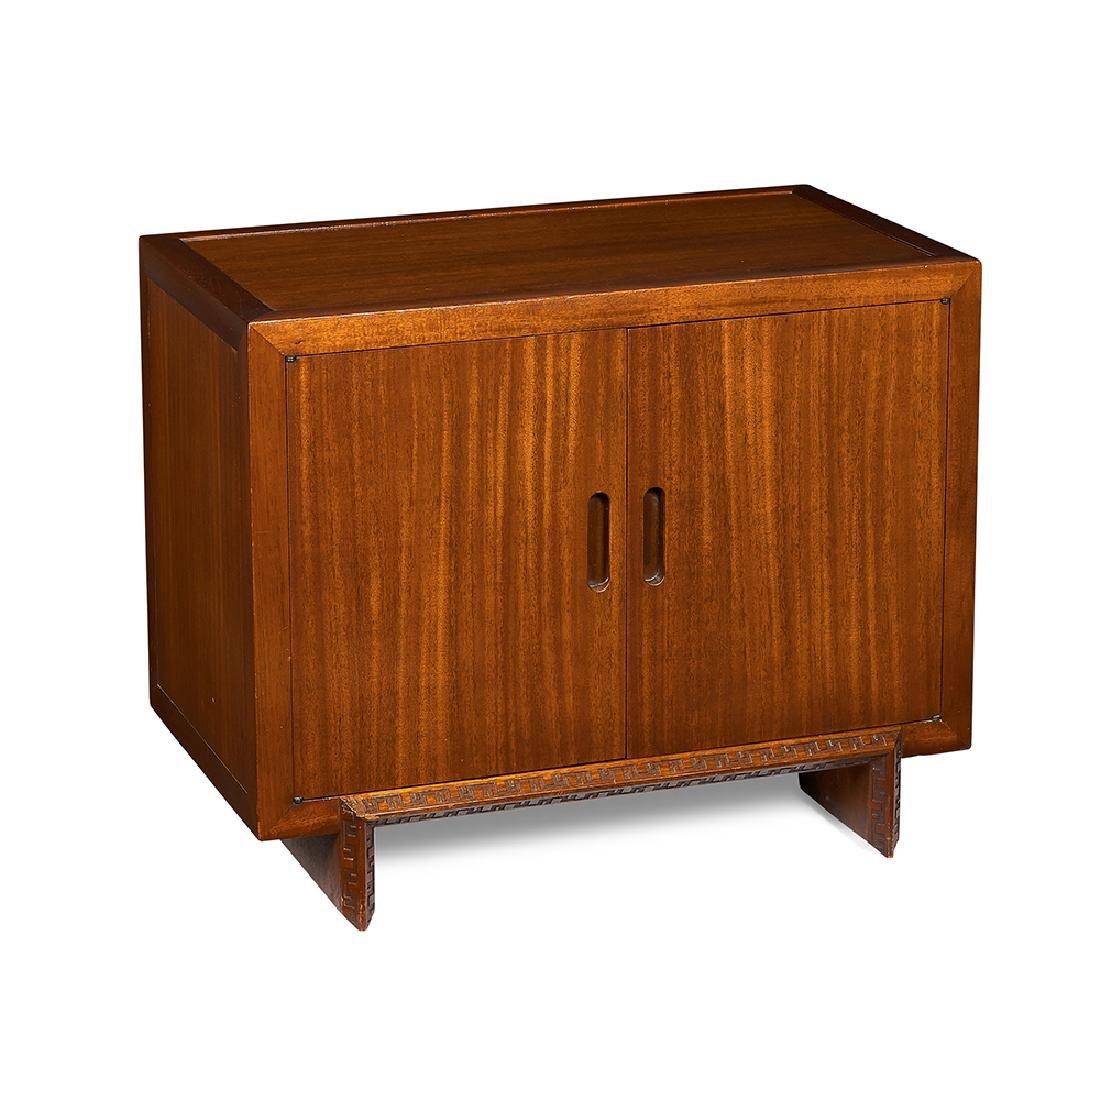 Frank Lloyd Wright / Henredon two door cabinet